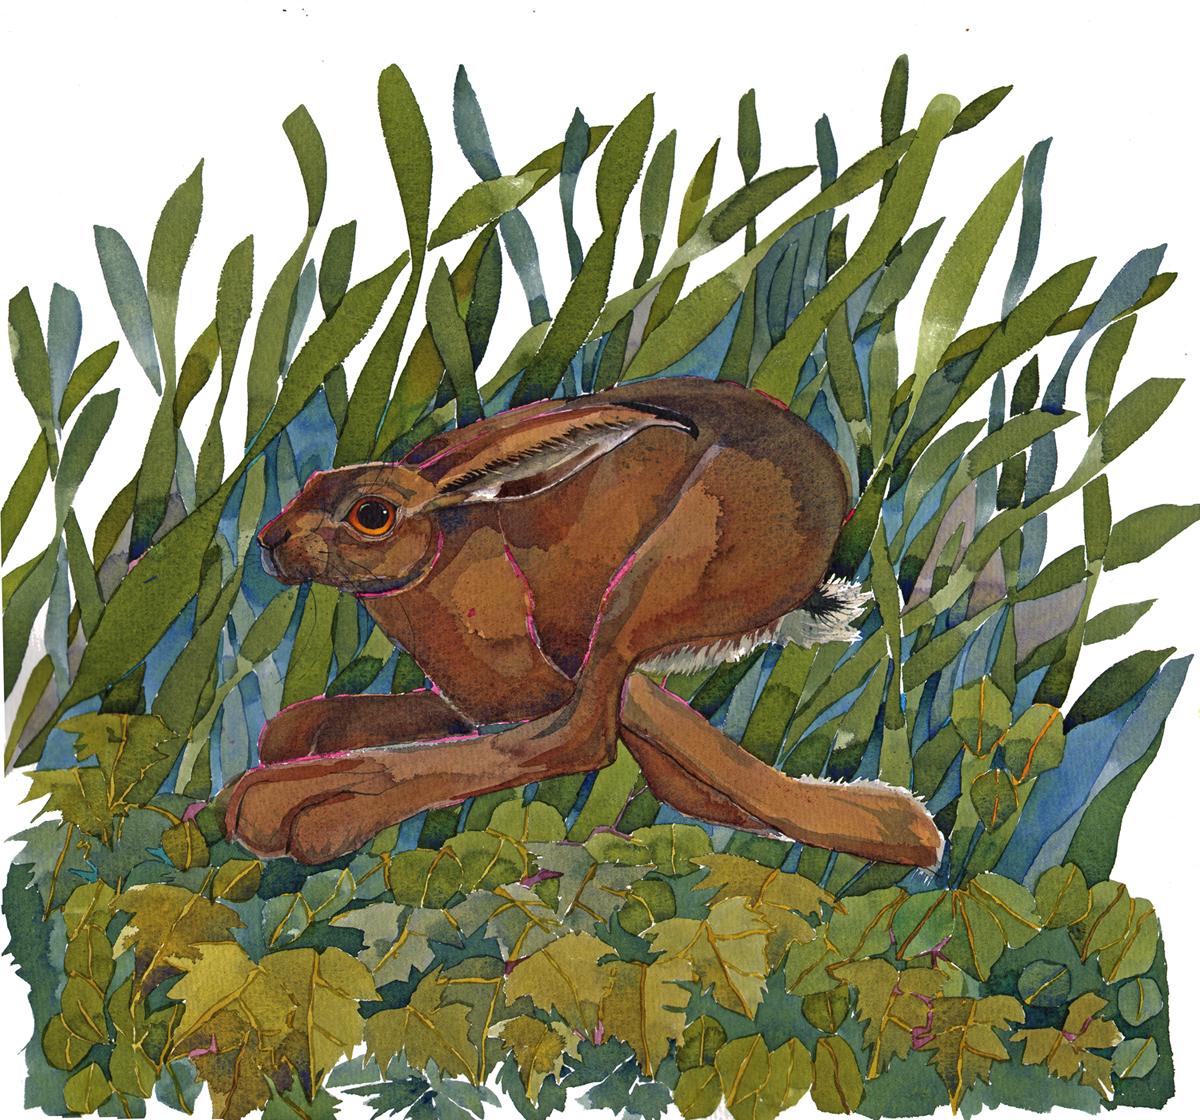 Running Hare I image